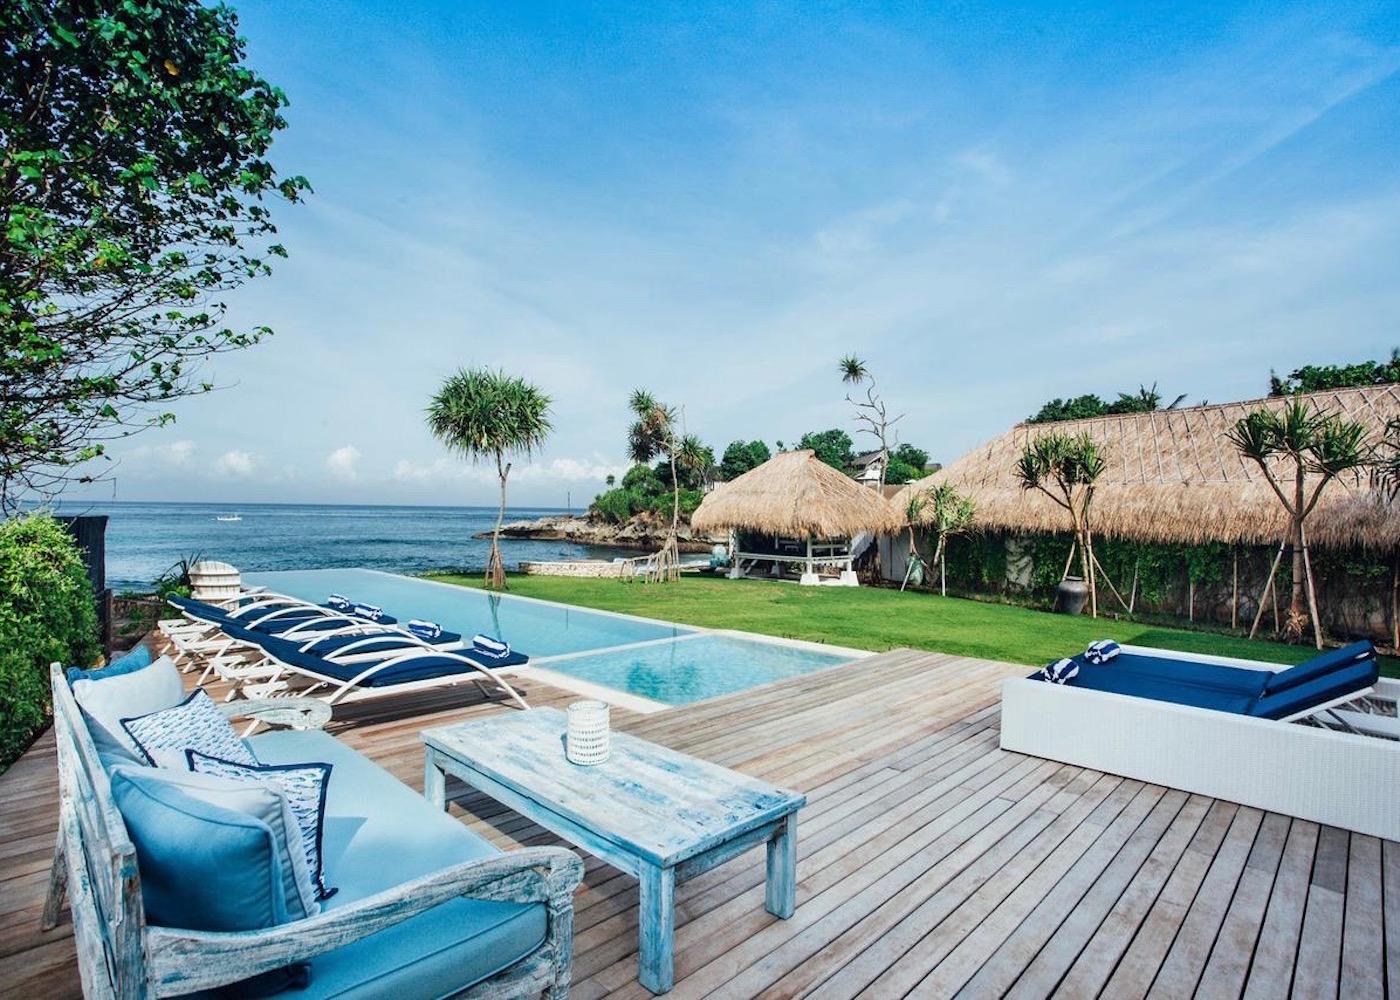 The Beach Shack villa on Nusa Lembongan island in Bali, Indonesia